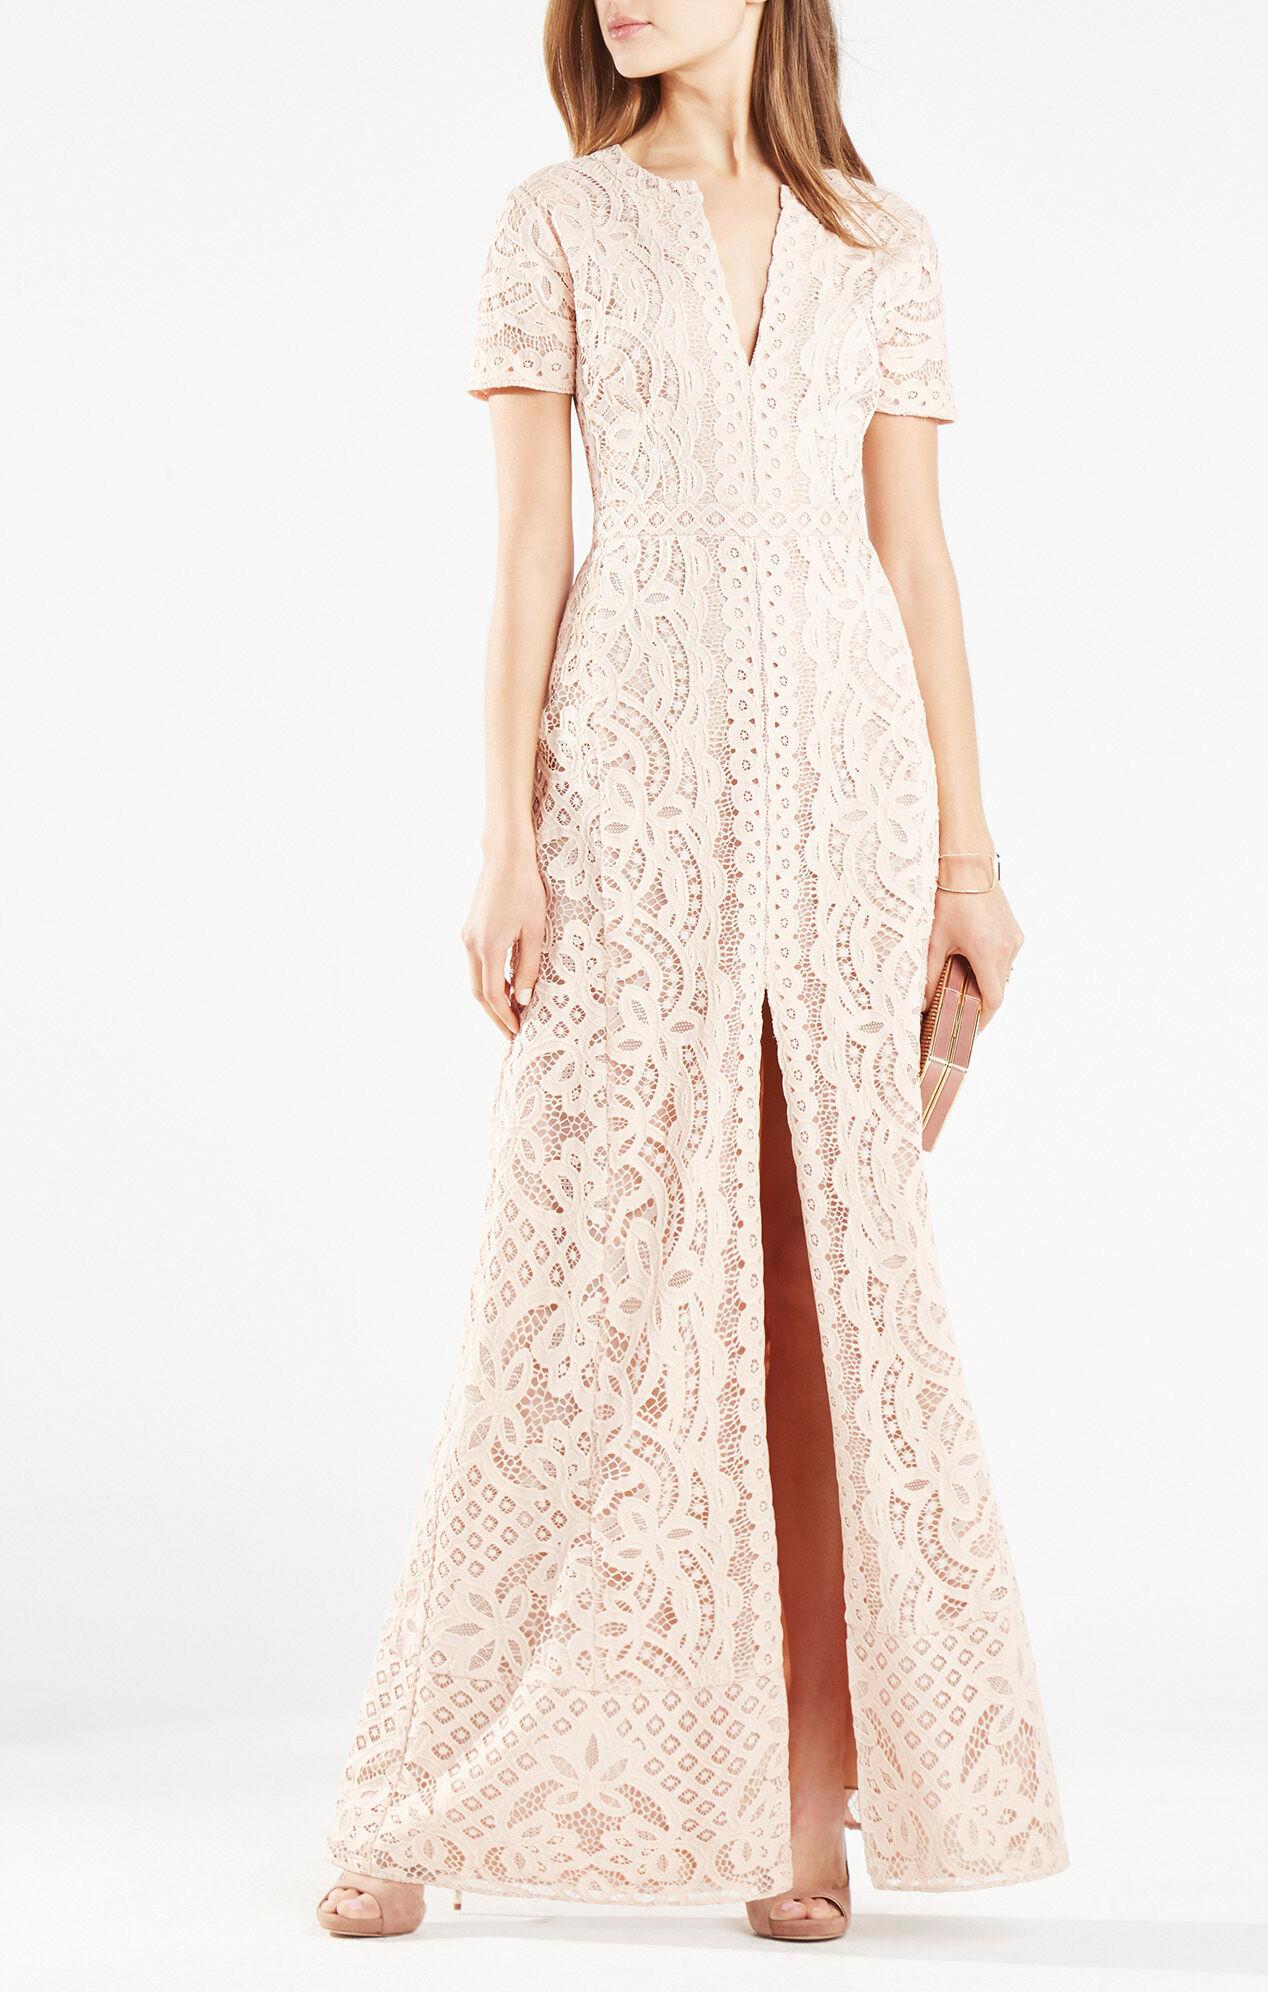 Cailean Floral Lace Gown